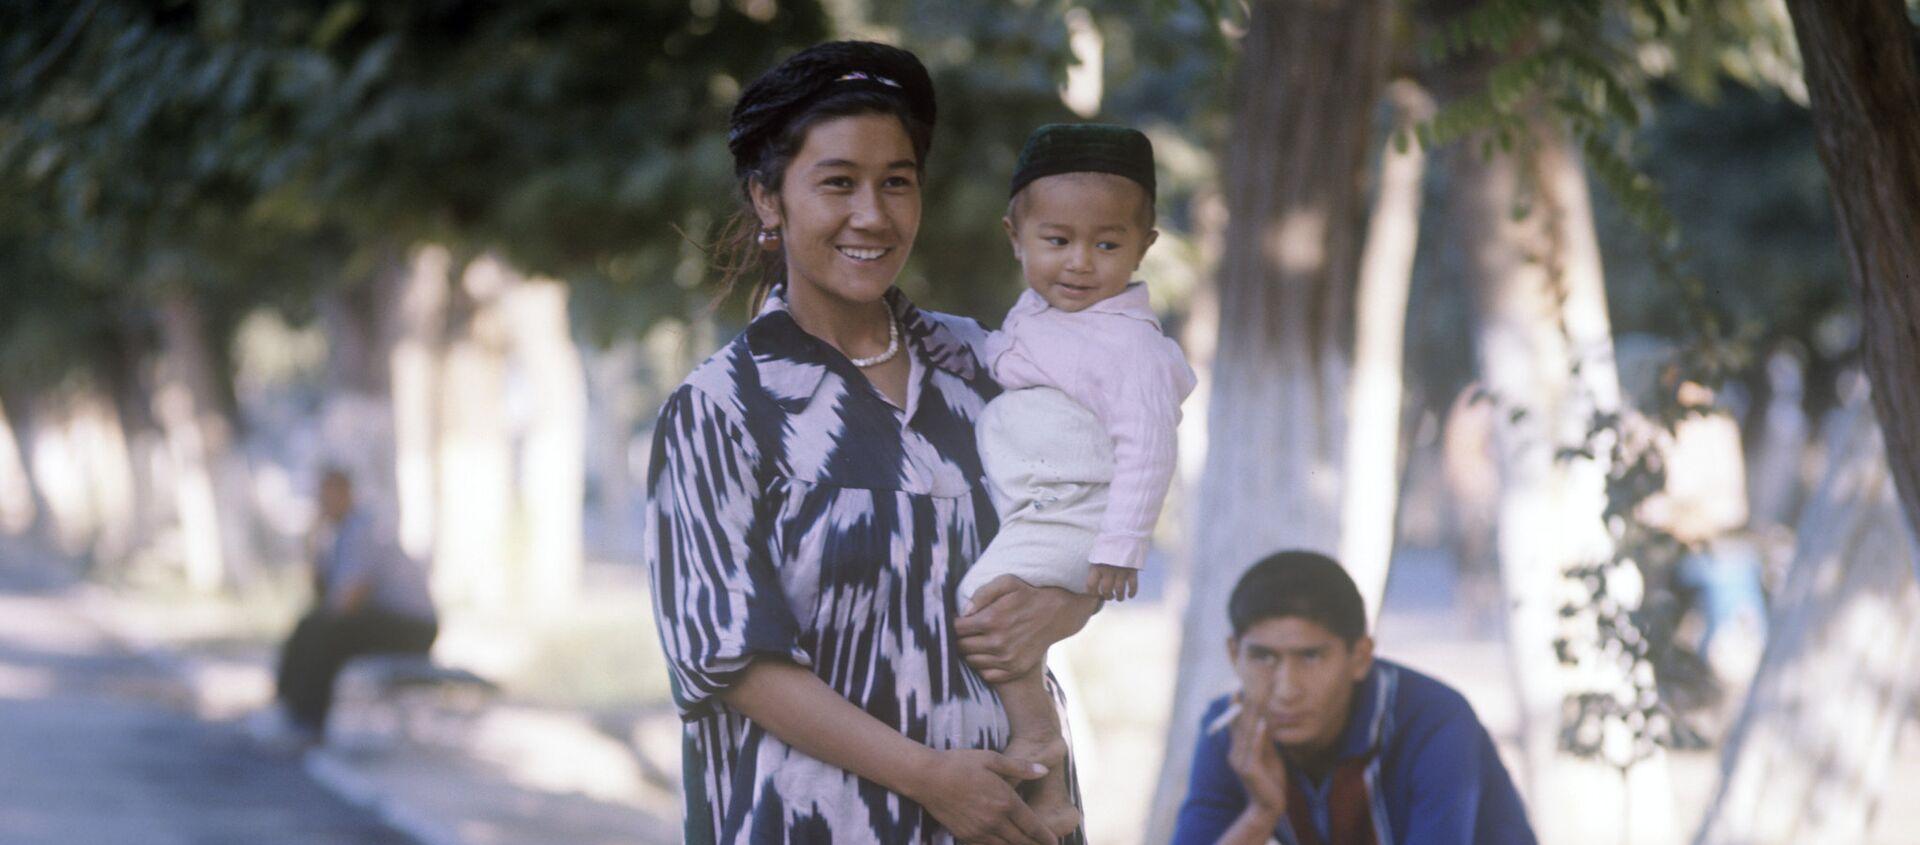 Колхозница Ширманхан Гафурова с сыном Кабулджаном - Sputnik Узбекистан, 1920, 21.01.2018